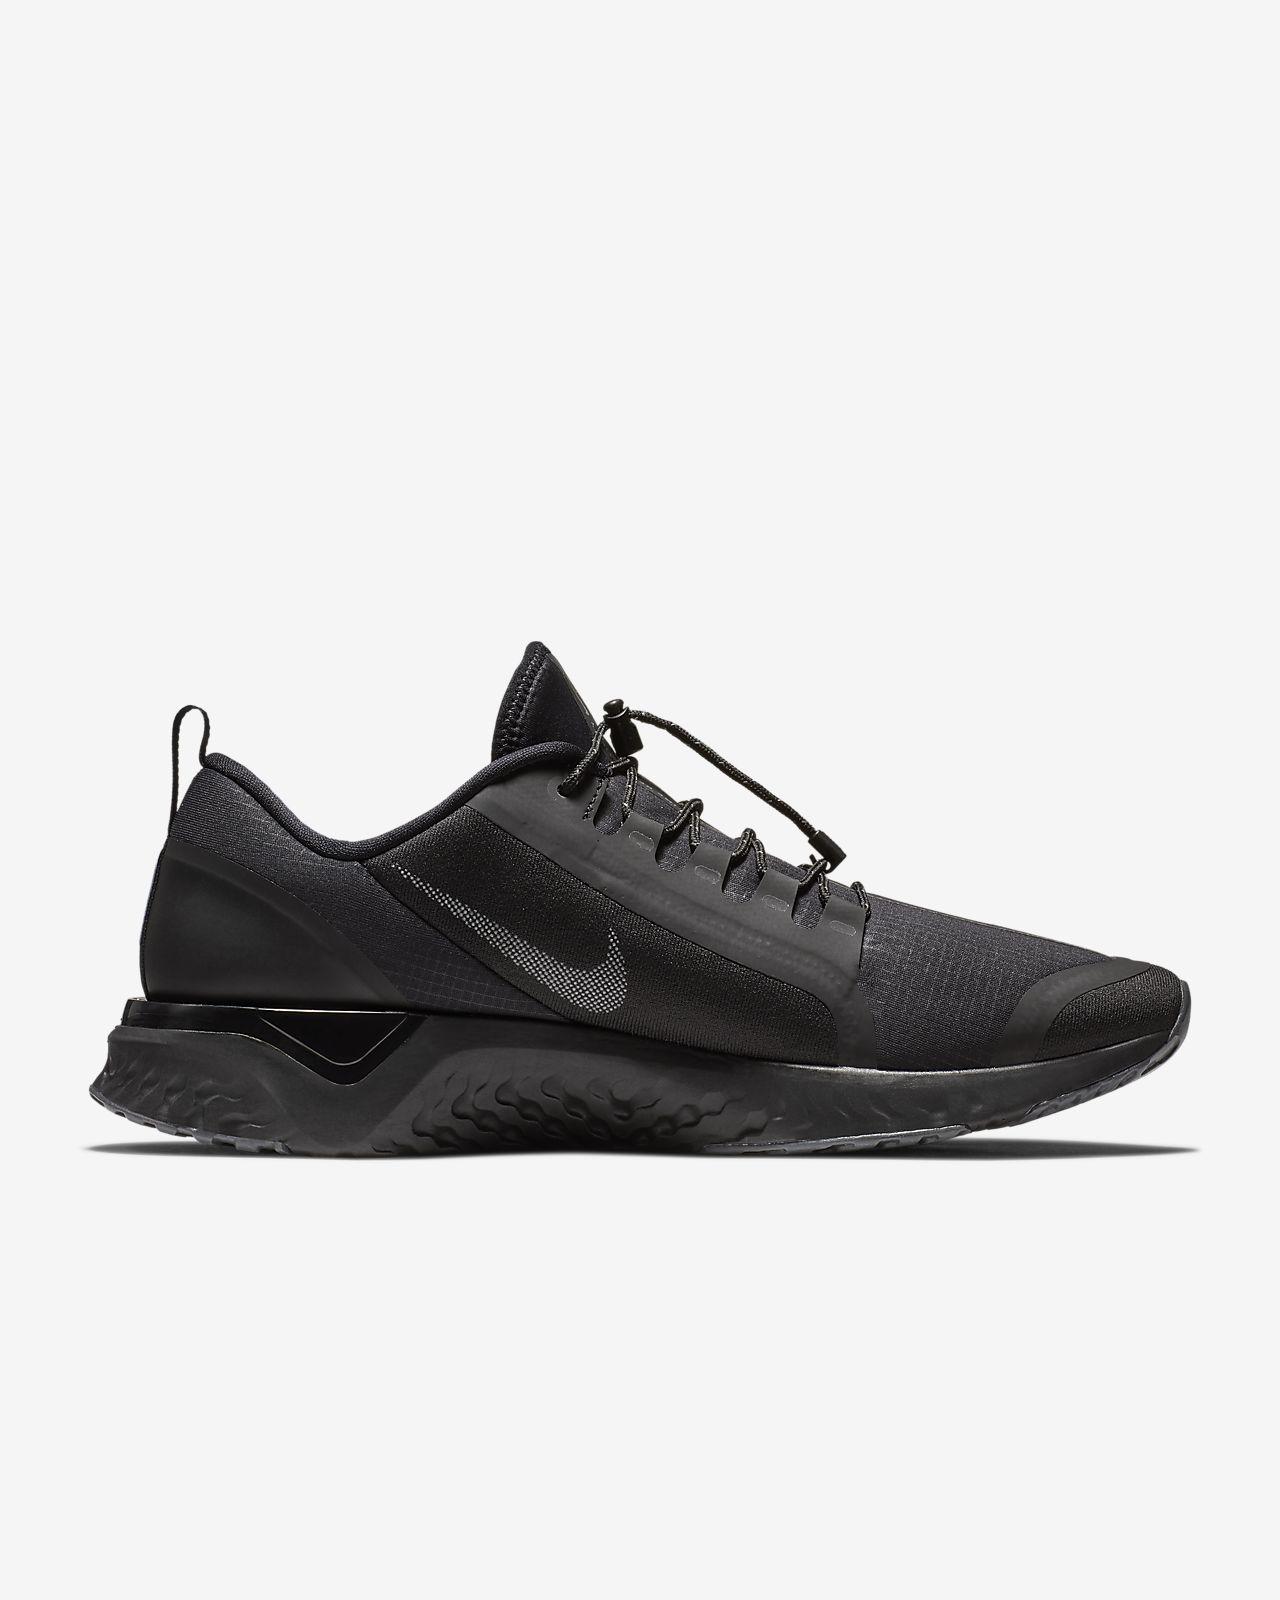 2cb01773182 Nike Odyssey React Shield Water-Repellent Men s Running Shoe. Nike ...